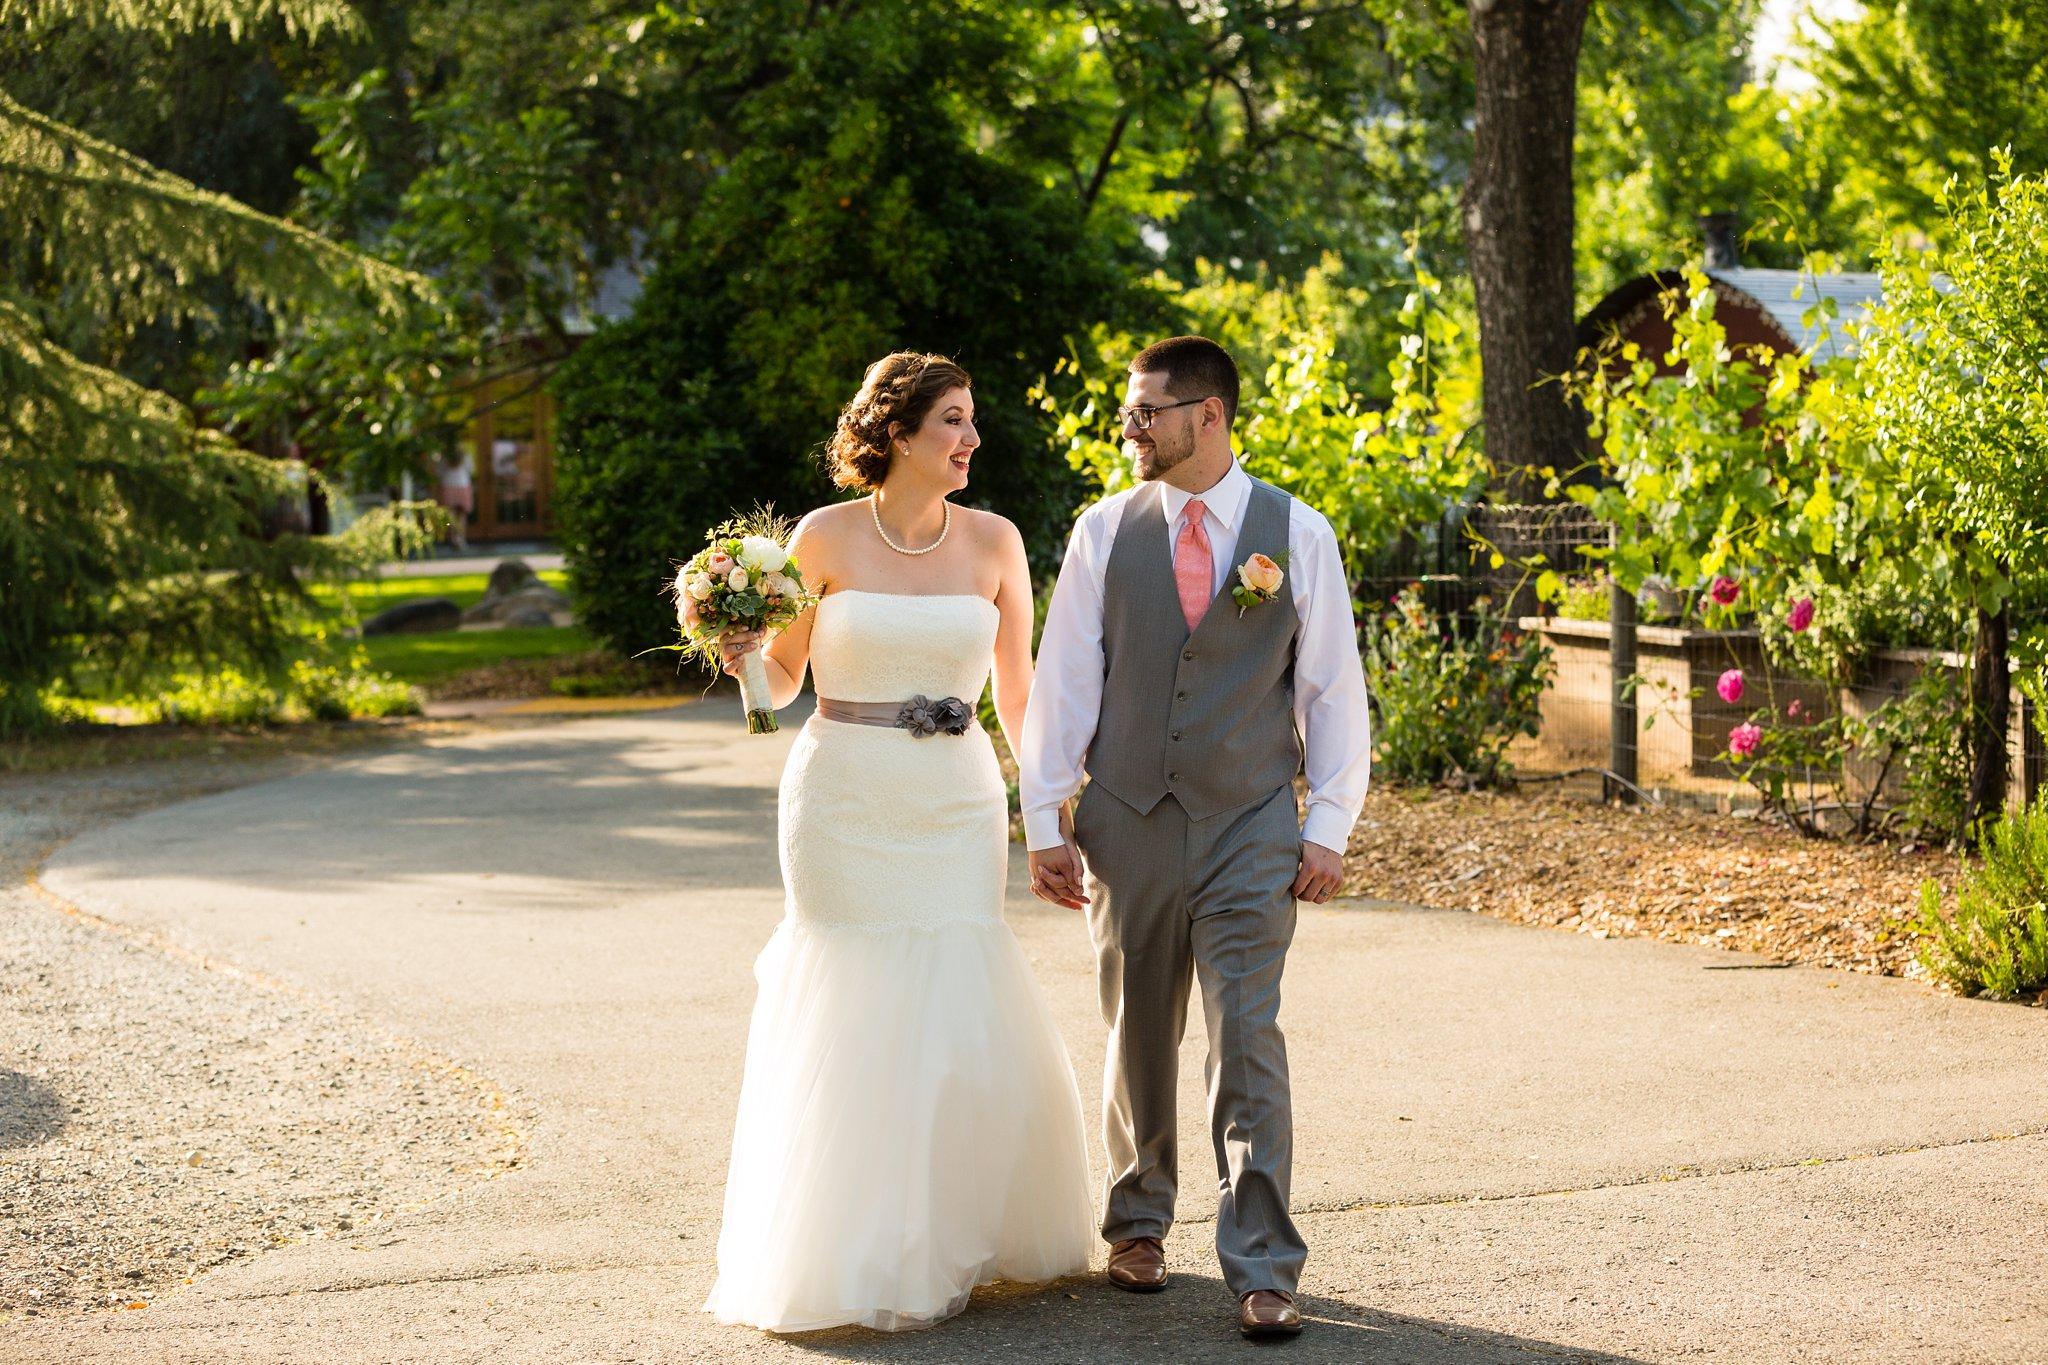 170507_blog_megan_david_wedding_loomis_flower_farm_inn_danielle_alysse_photography_sacramento_photographer0393_WEB.jpg